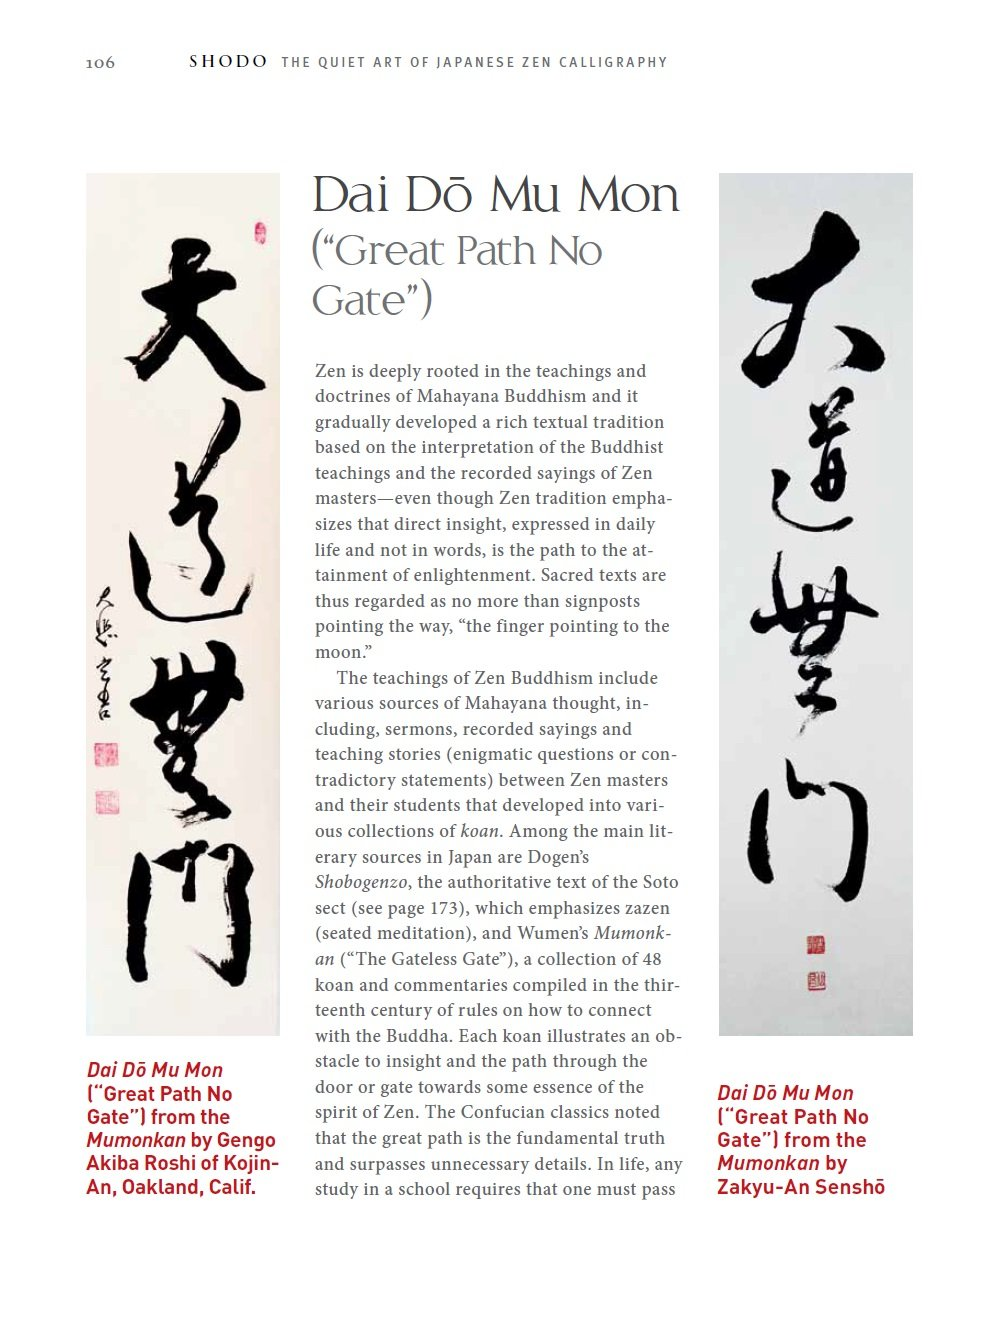 Shodo The Quiet Art Of Japanese Zen Calligraphy Amazon Co Uk